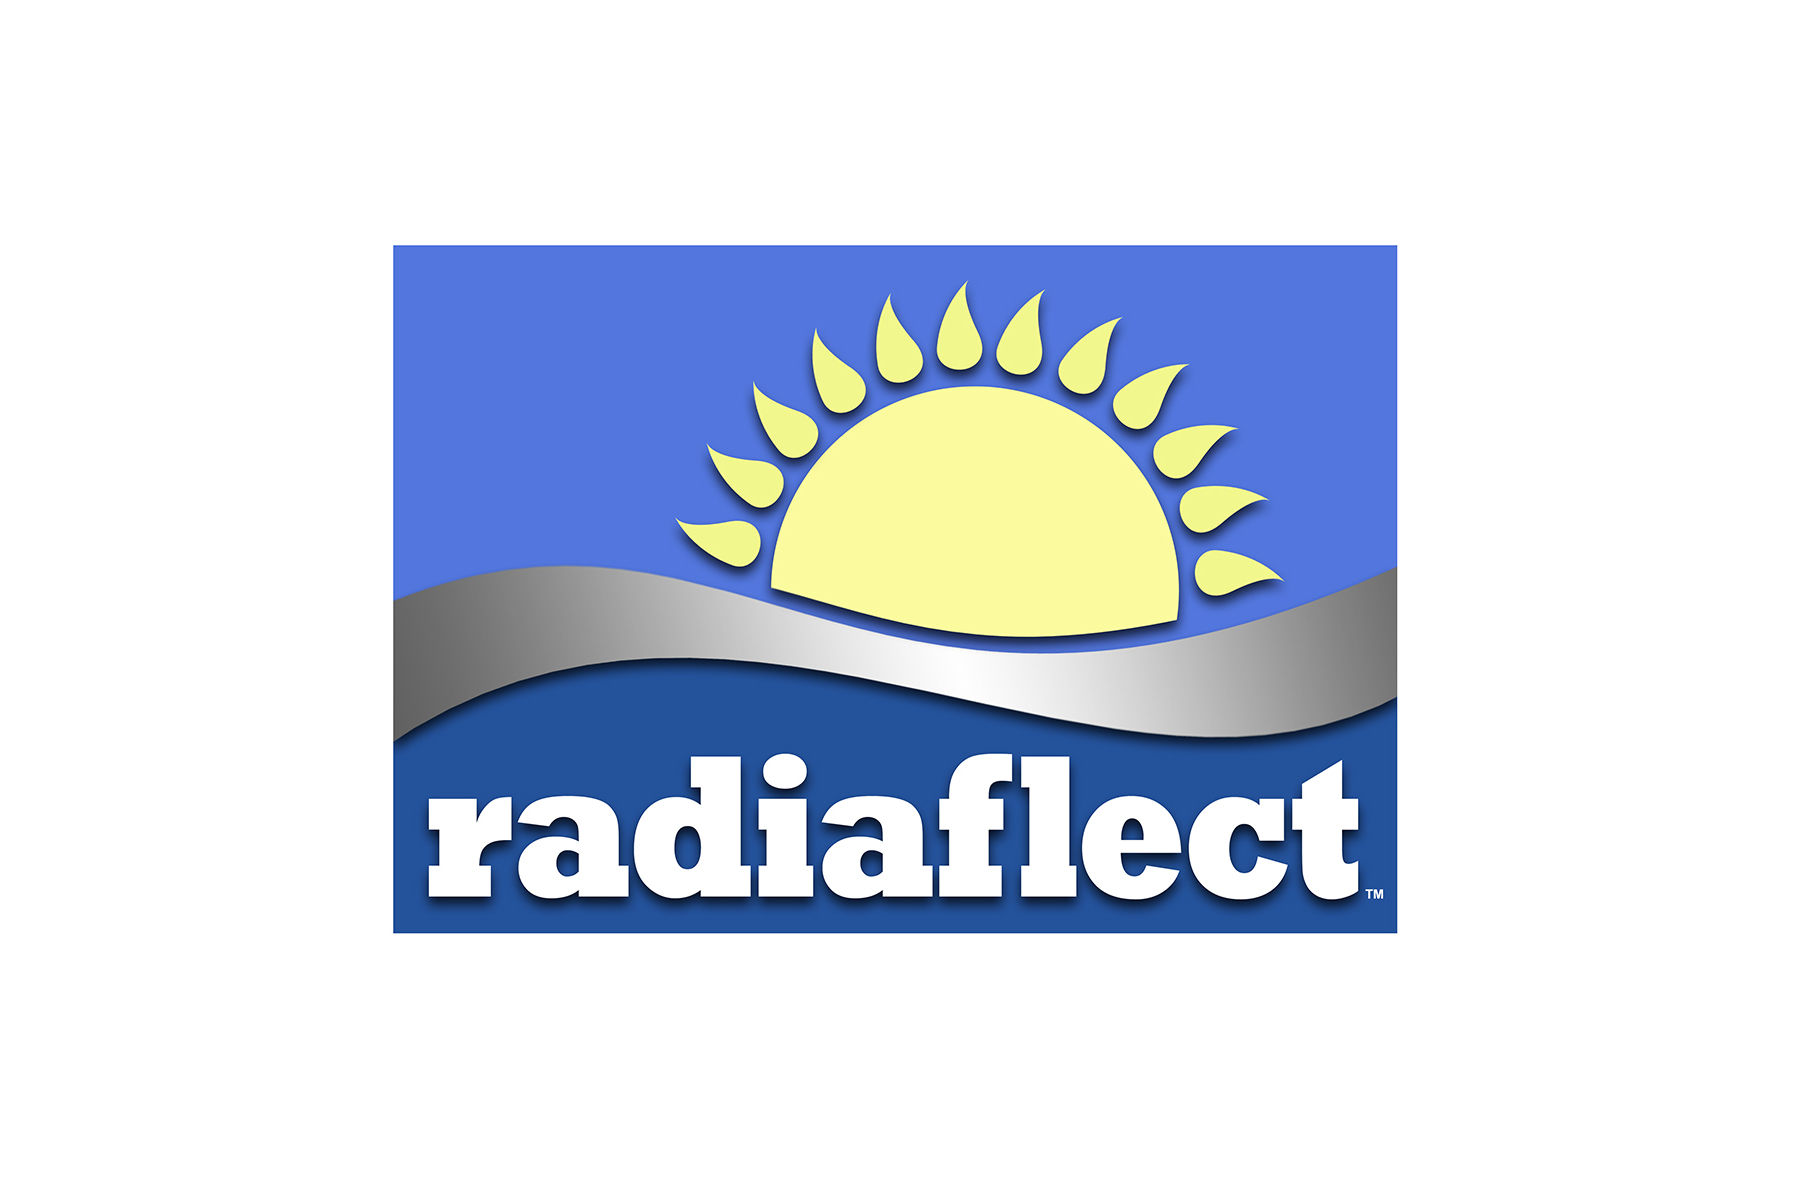 logo-03-radiaflect.jpg